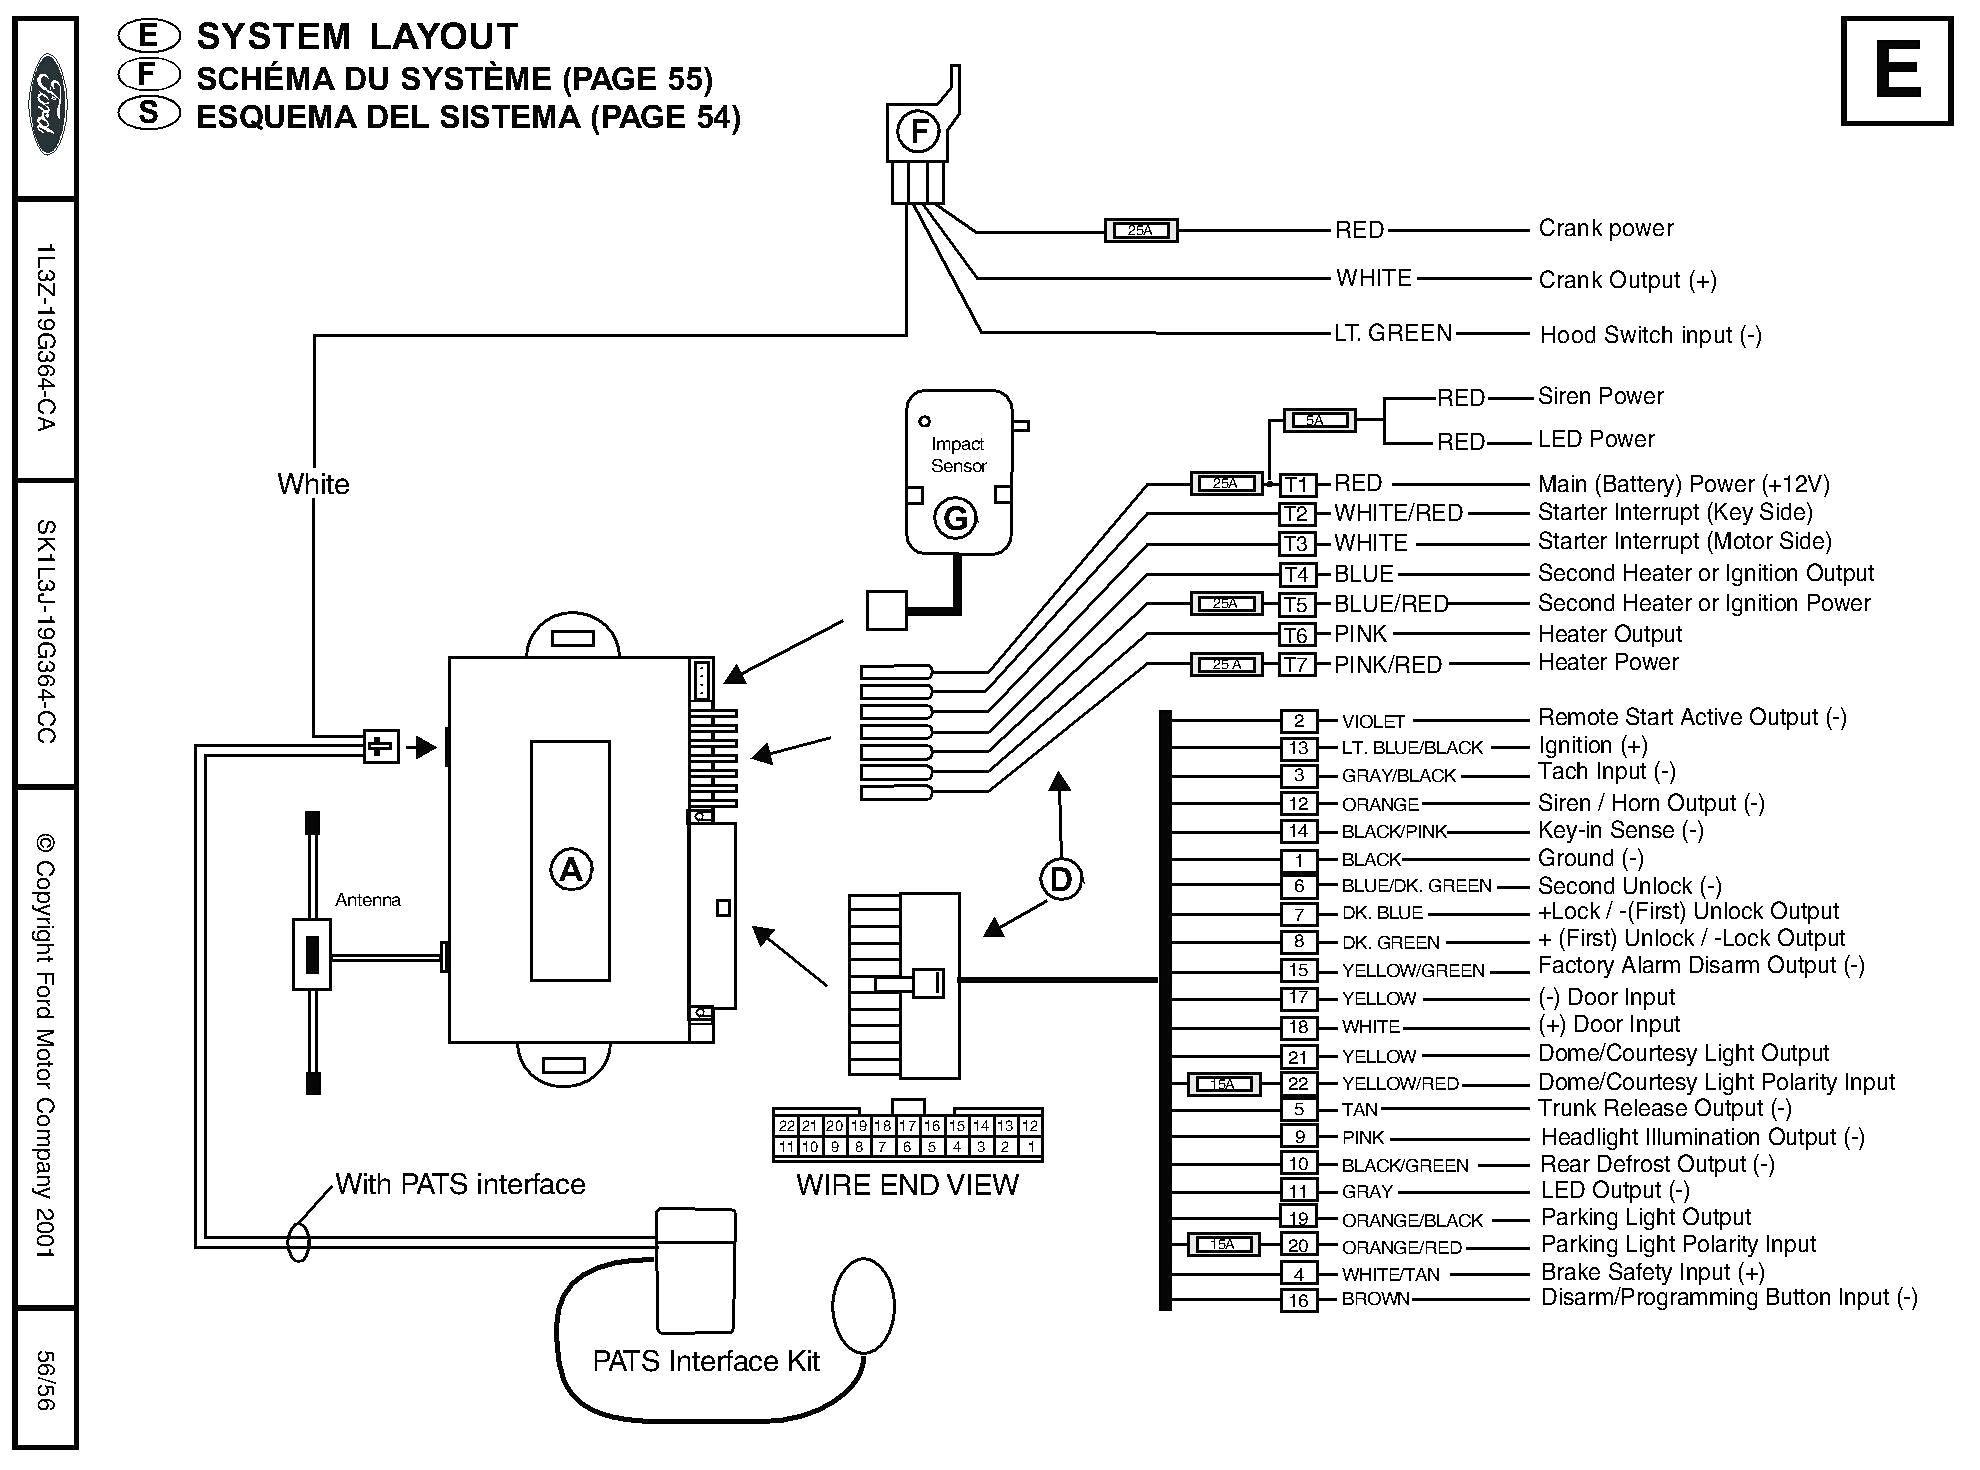 New Wiring Diagram Auto Electrical Con Imagenes Sistema Electrico Electrica